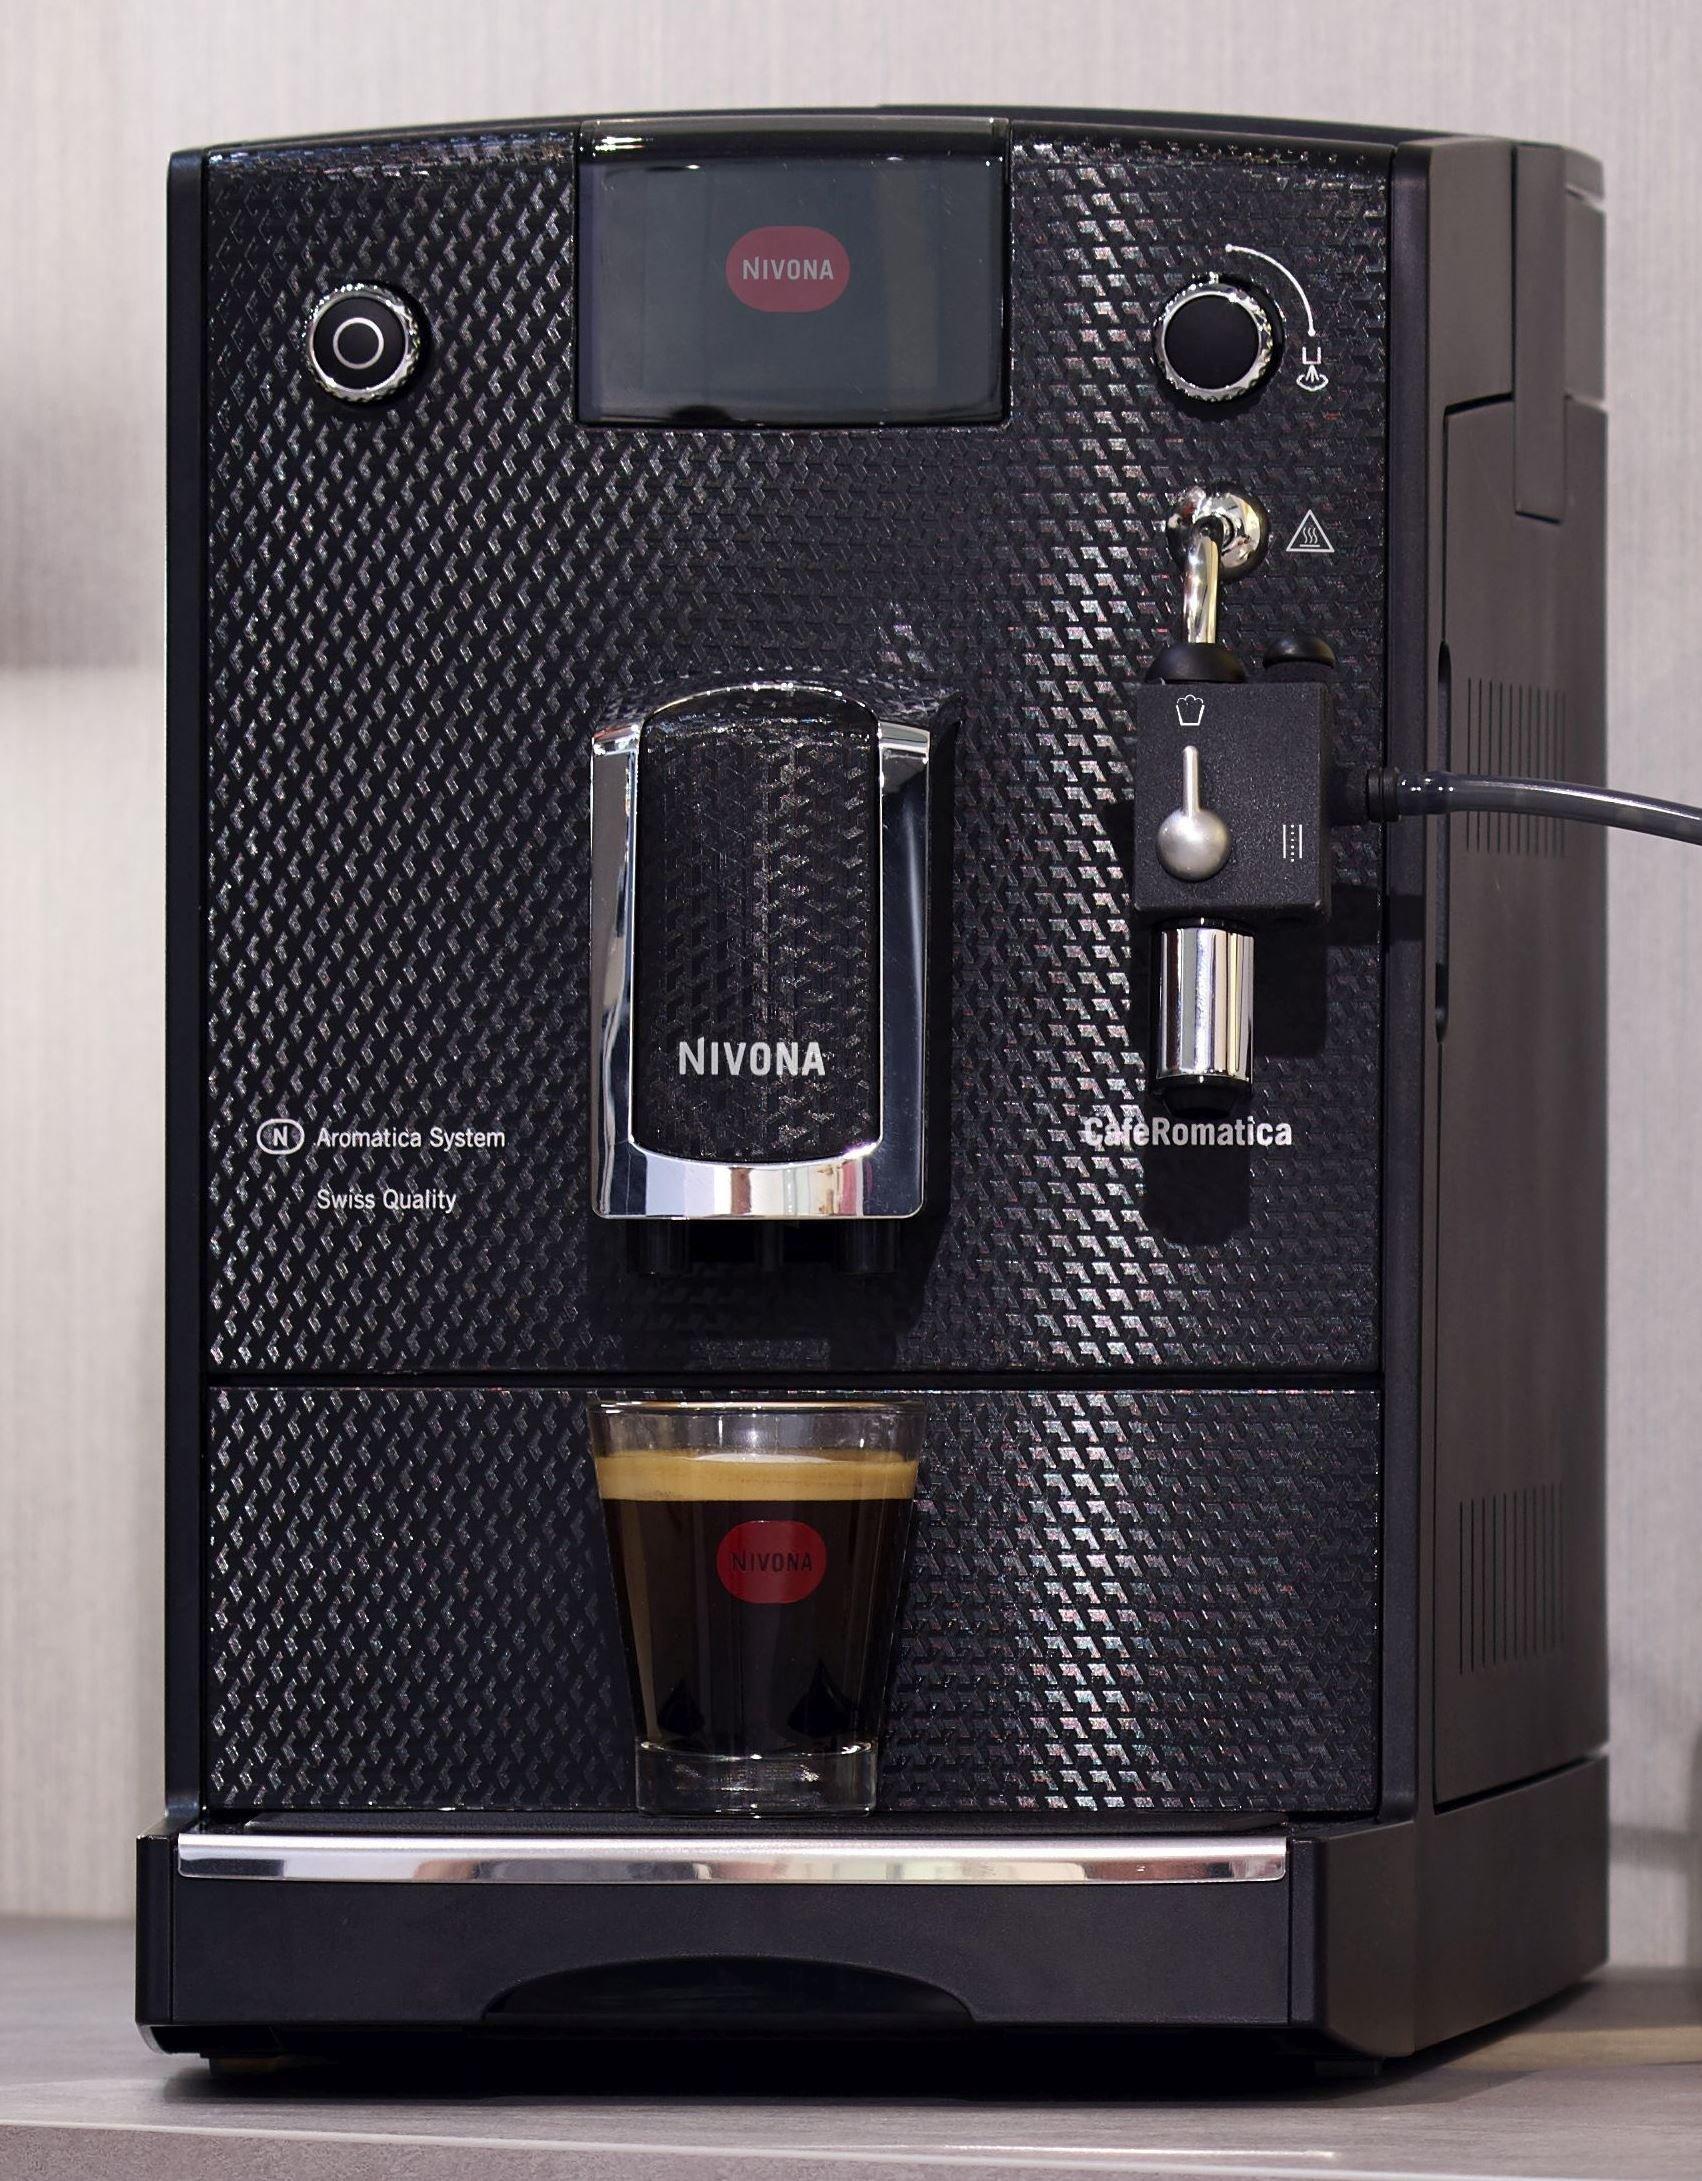 Nivona-CafeRomantica-680-Kaffeevollautomat-22-liters-schwarz